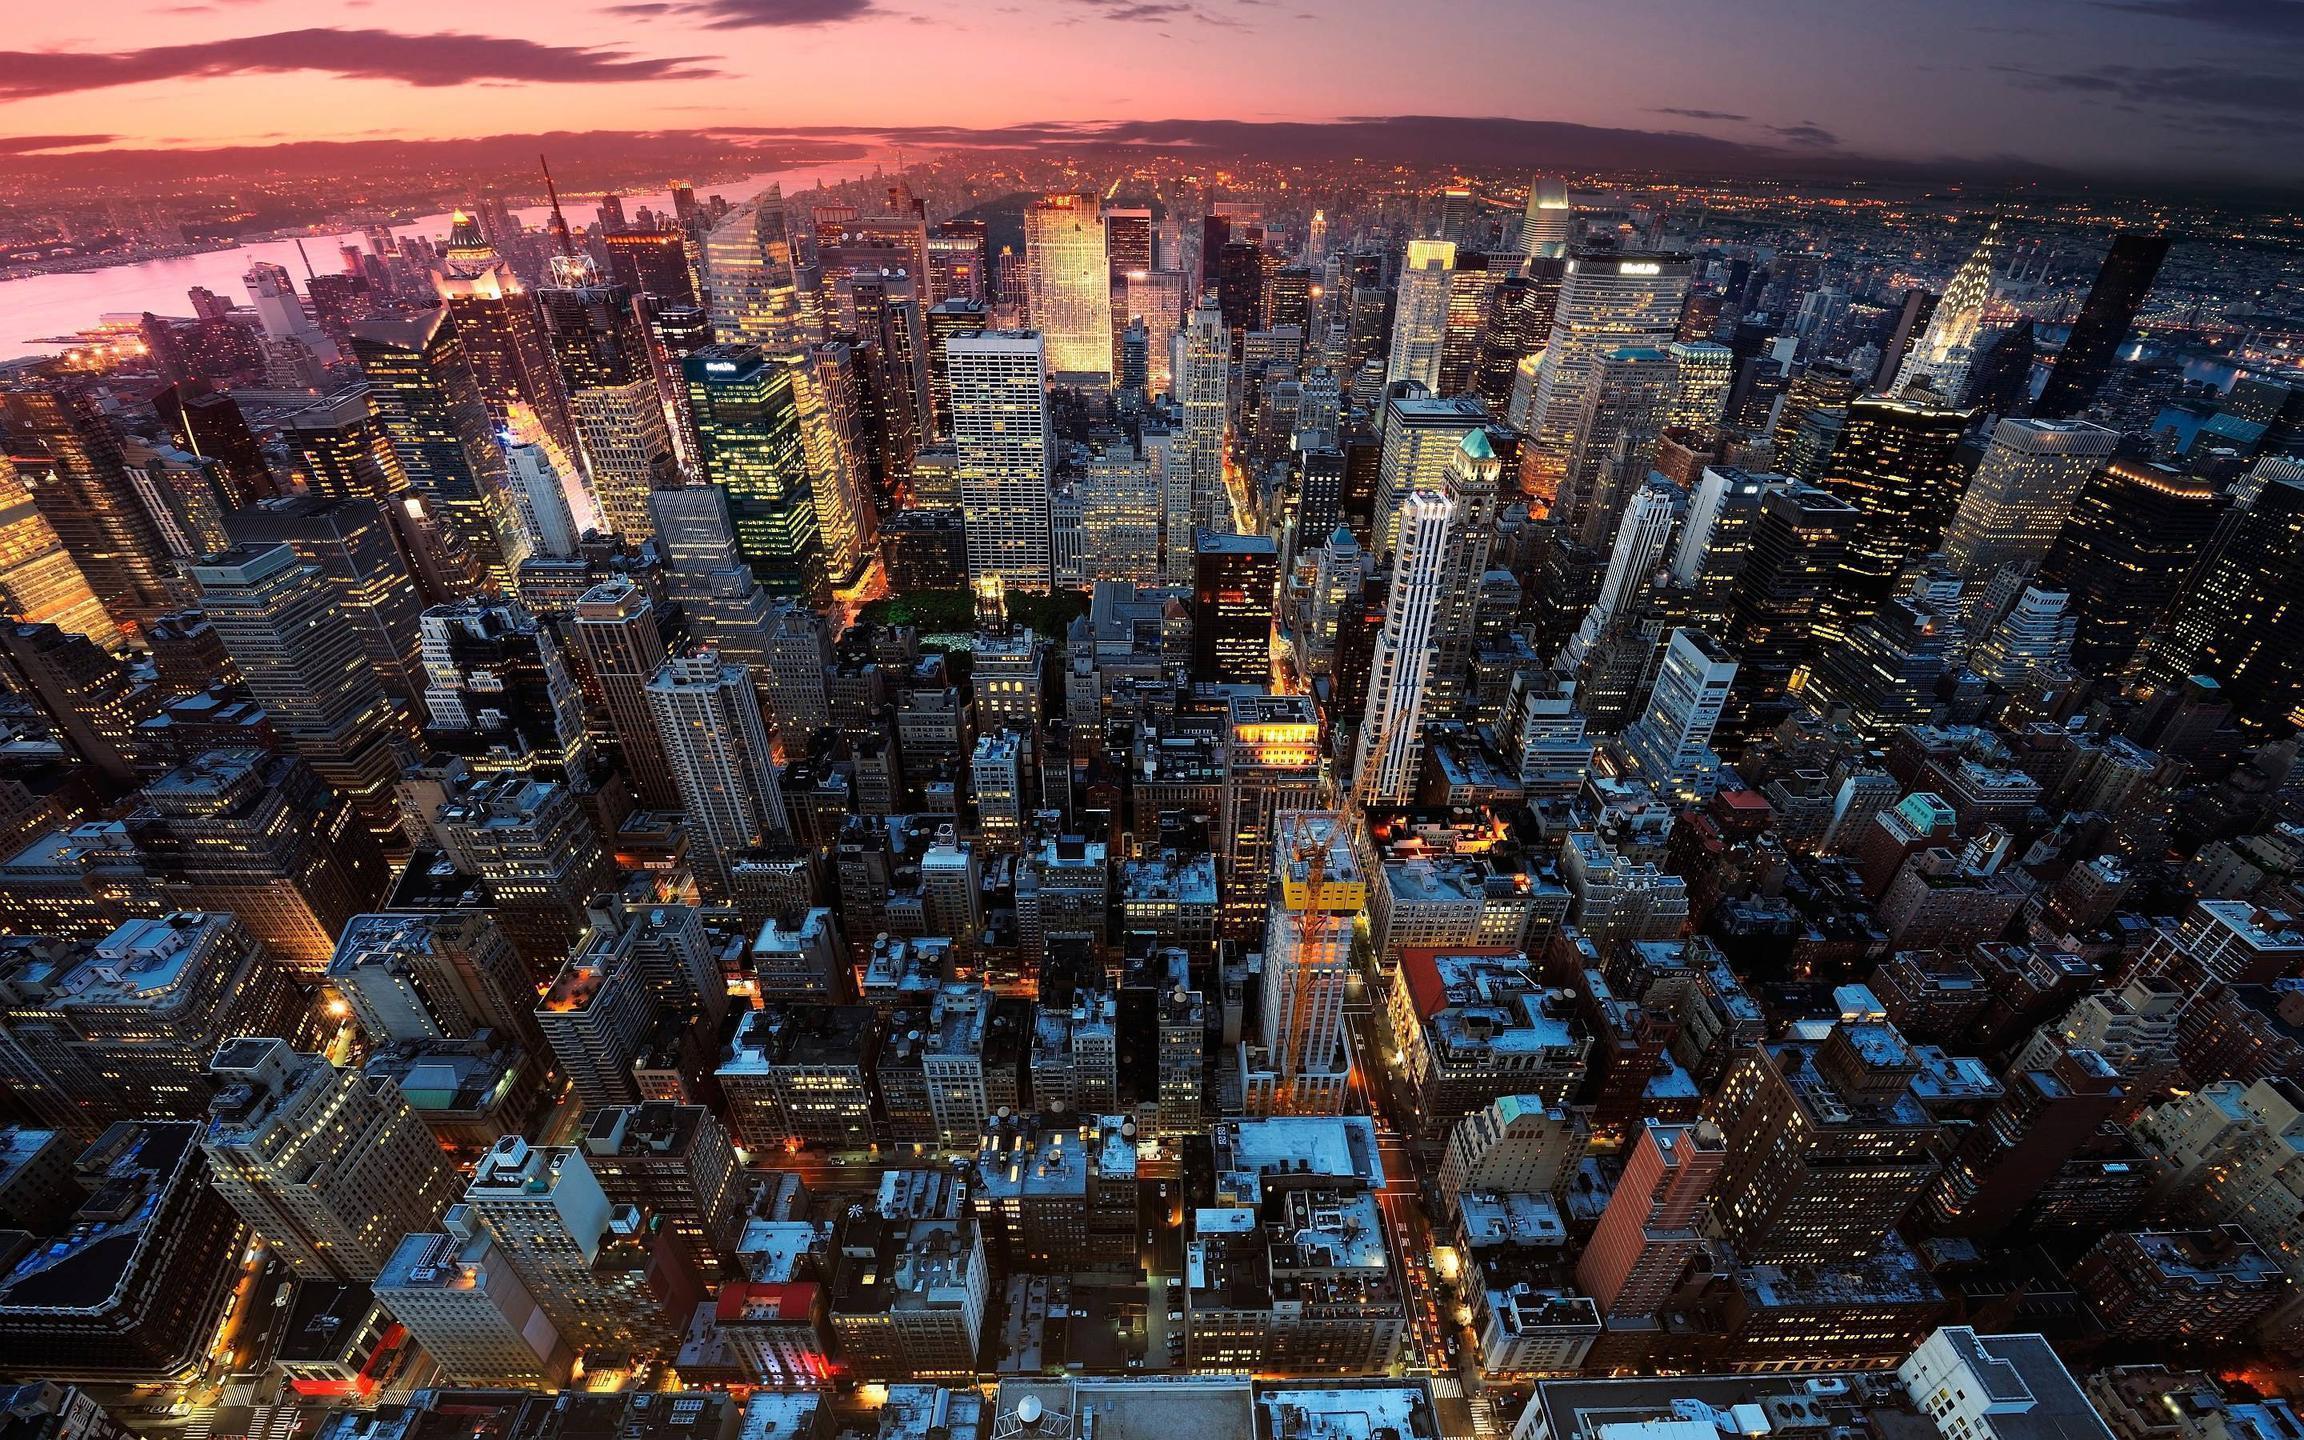 New-York-City-Wallpaper-HD-Widescreen | Marco Dalprato